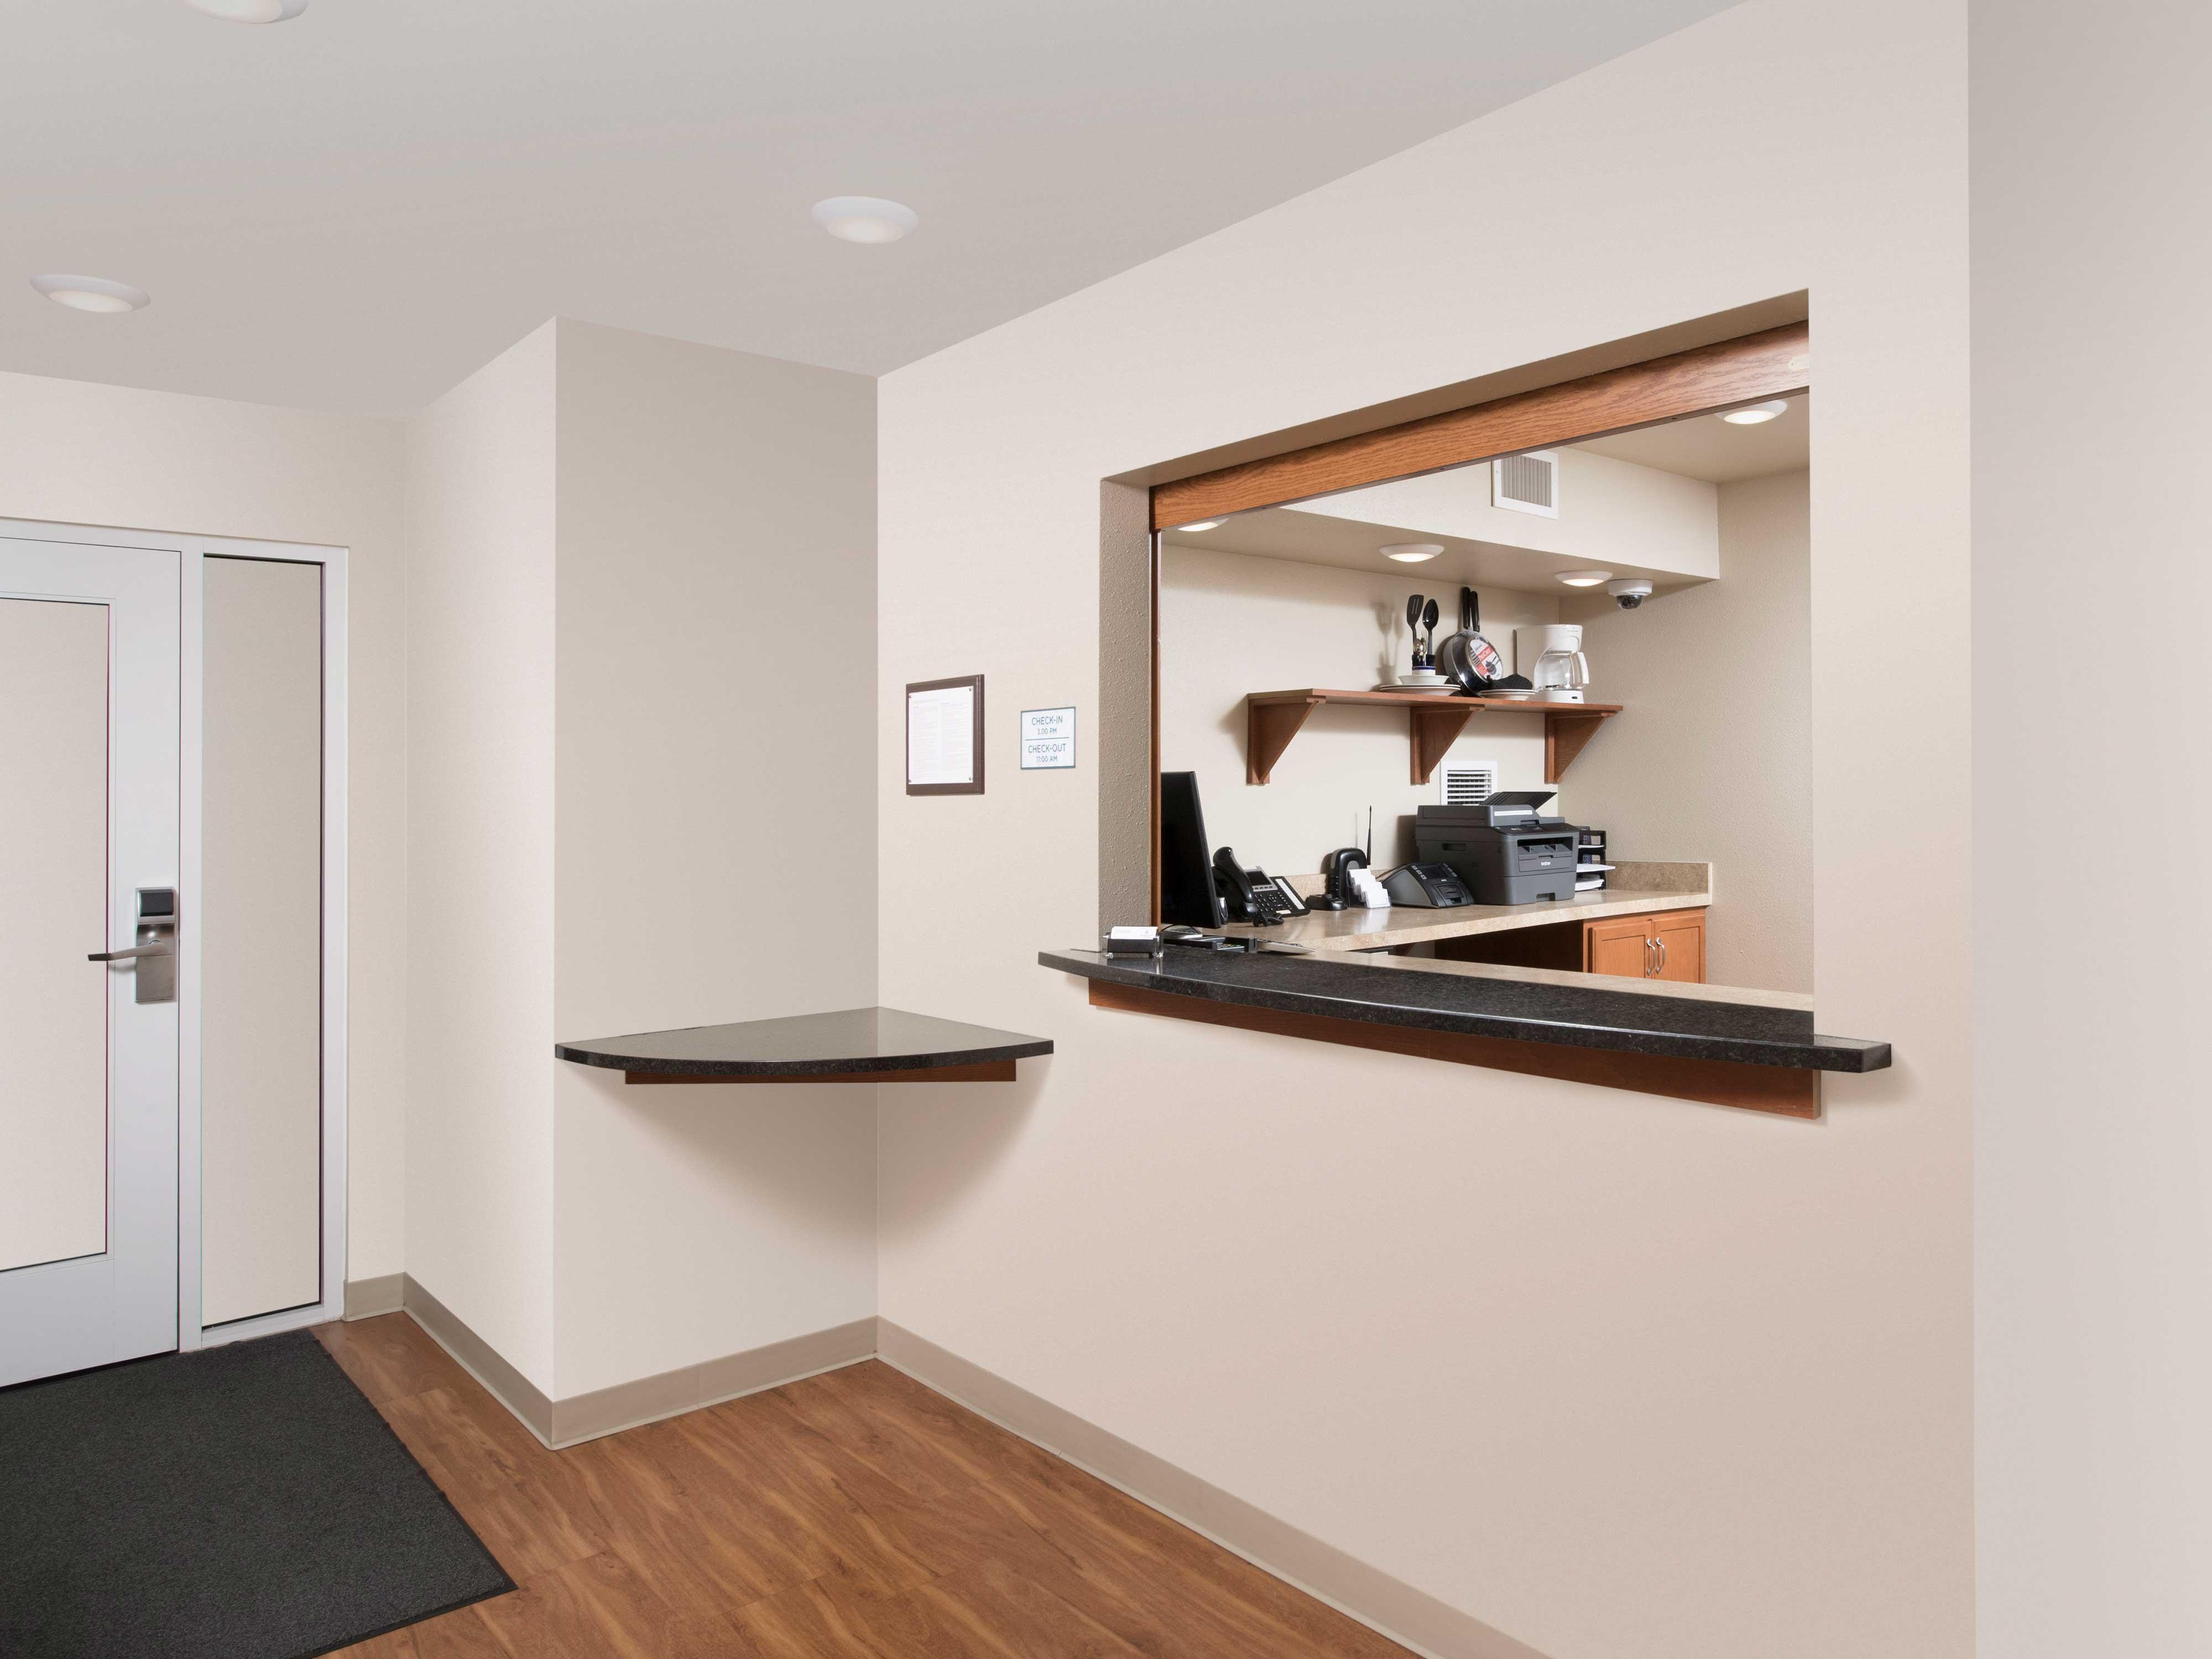 WoodSpring Suites Grand Rapids South image 16